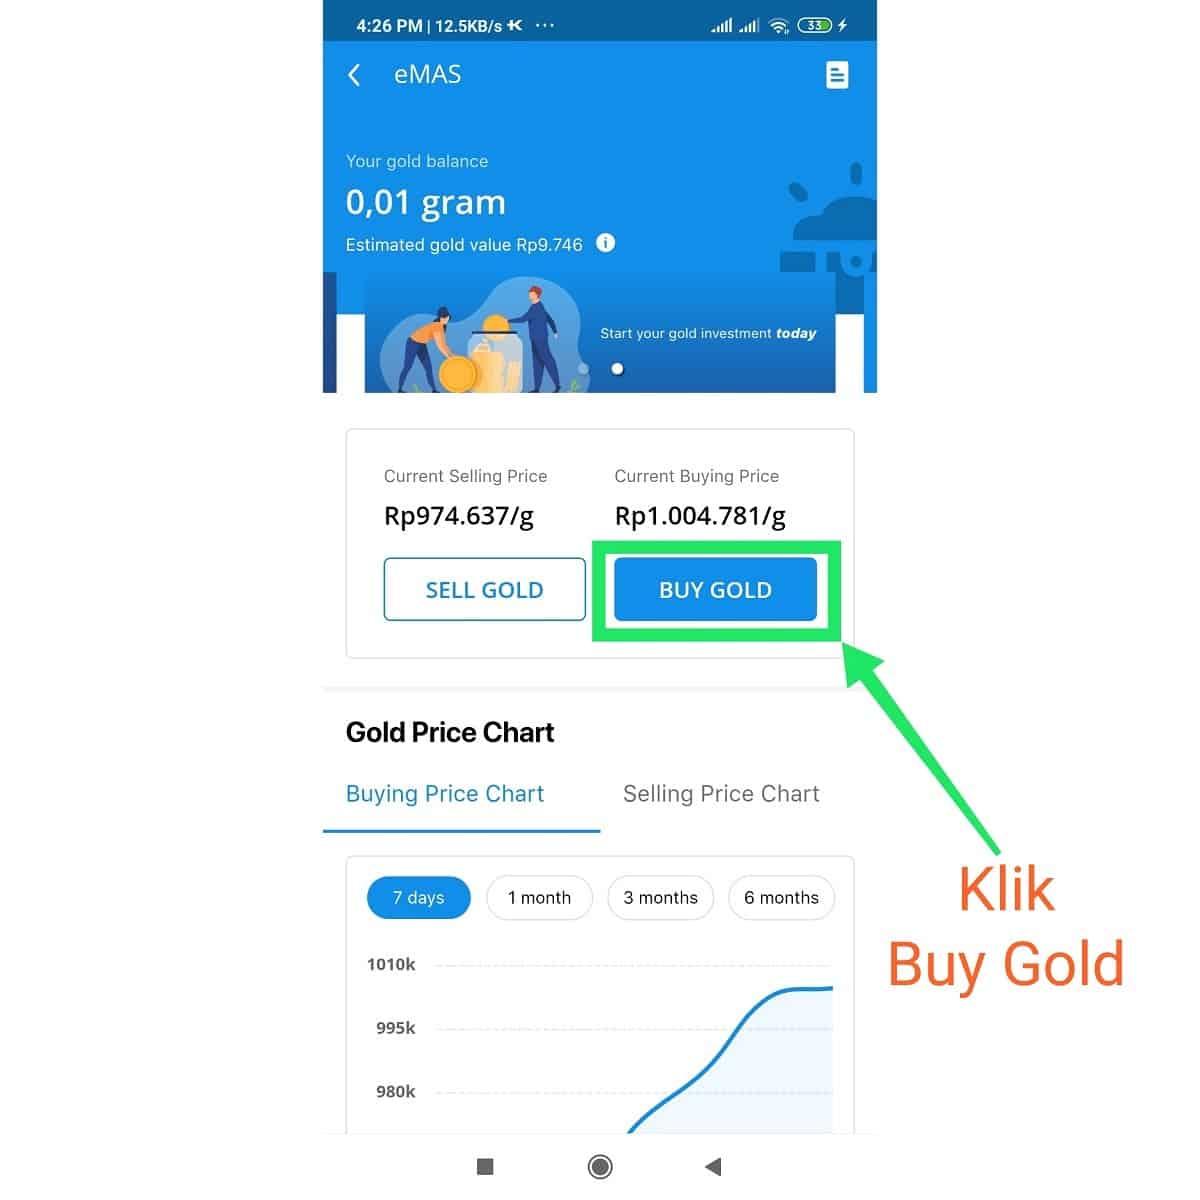 Klik Buy Gold